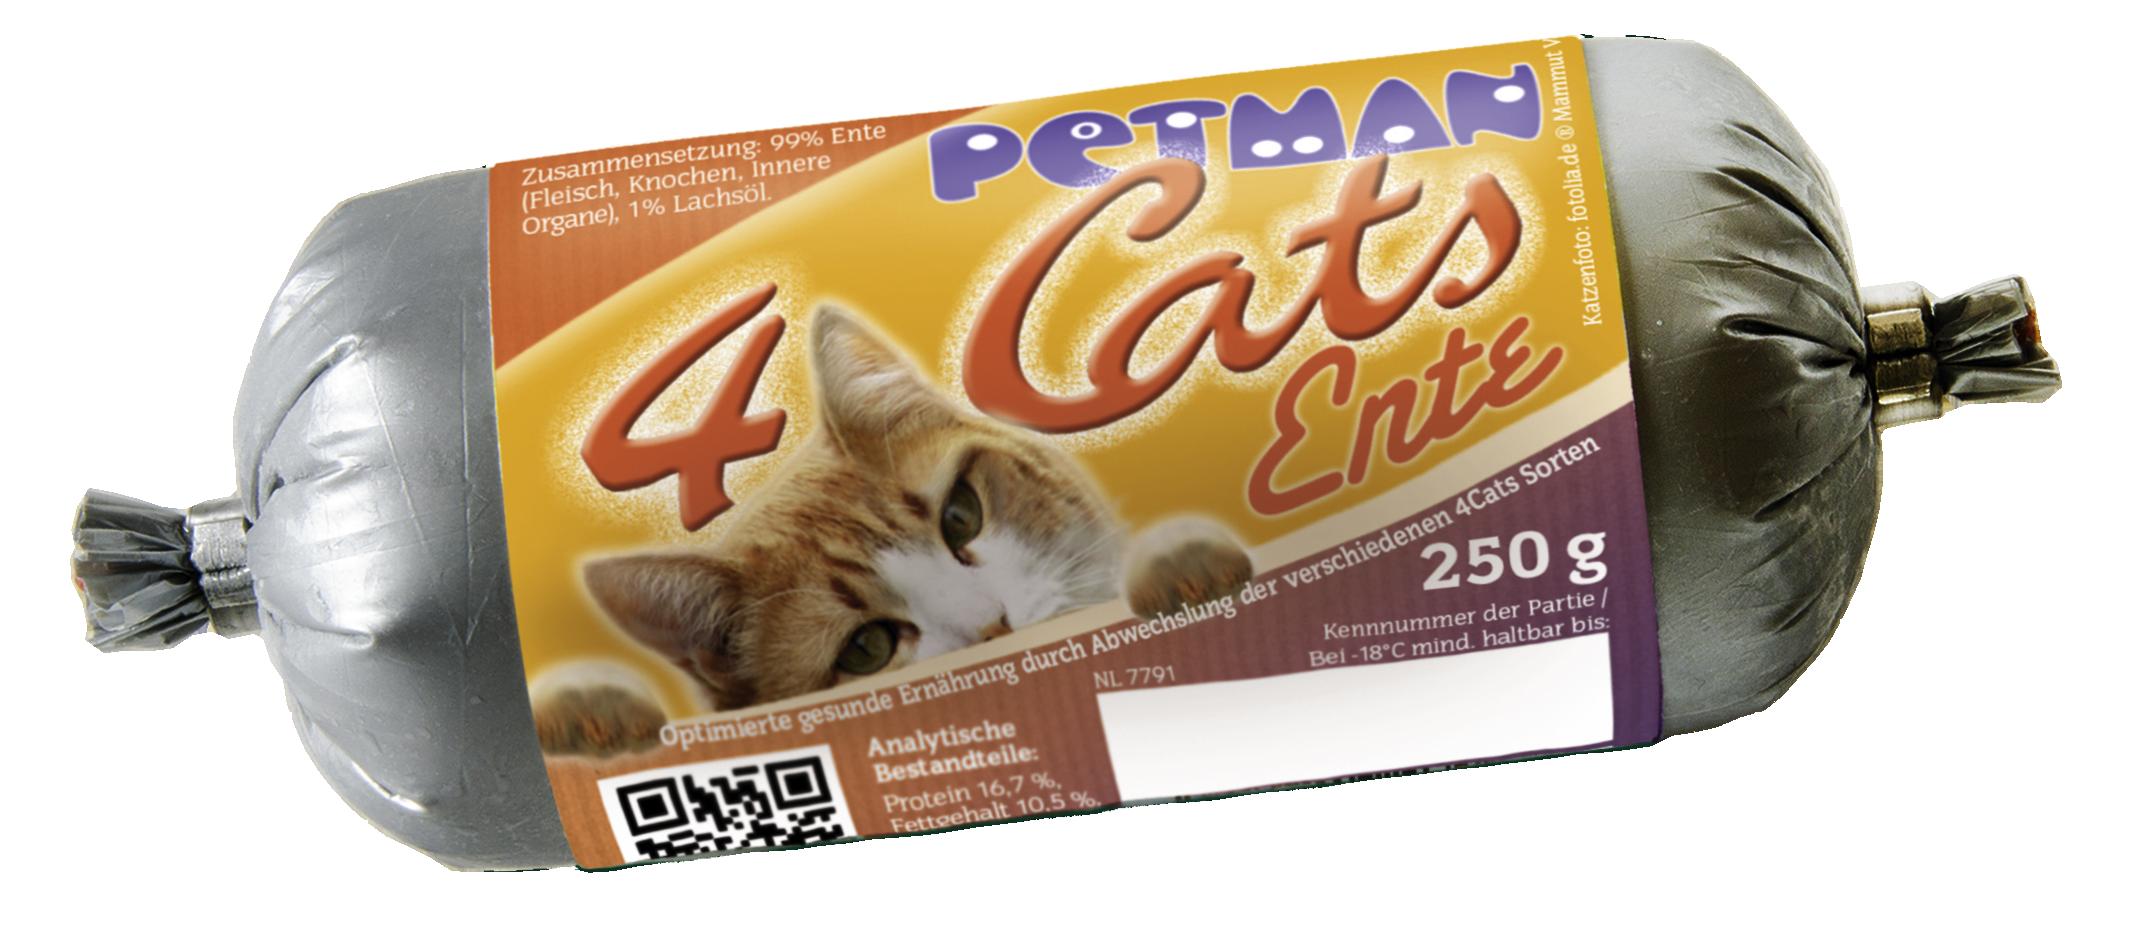 Petman 4Cats Ente Wurst 250g